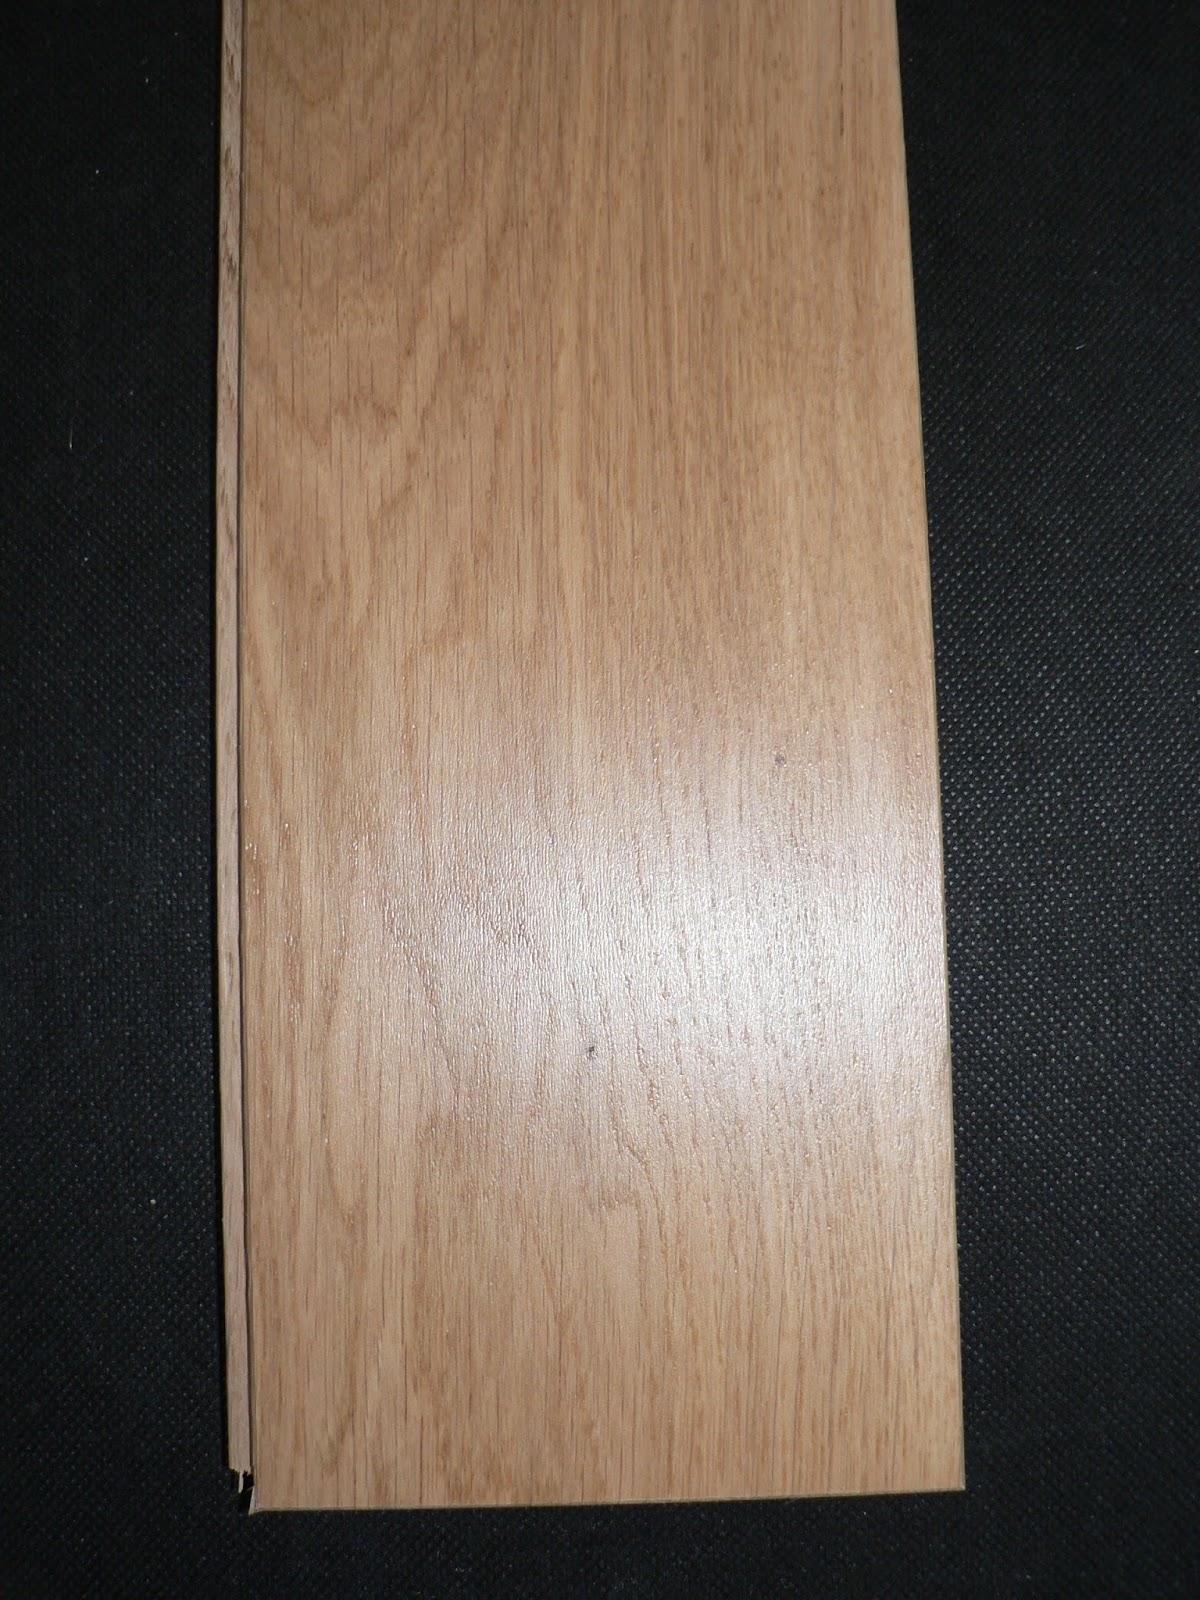 Entreprise briand g rard stratifi parquet massif - Parquet compatible plancher chauffant ...